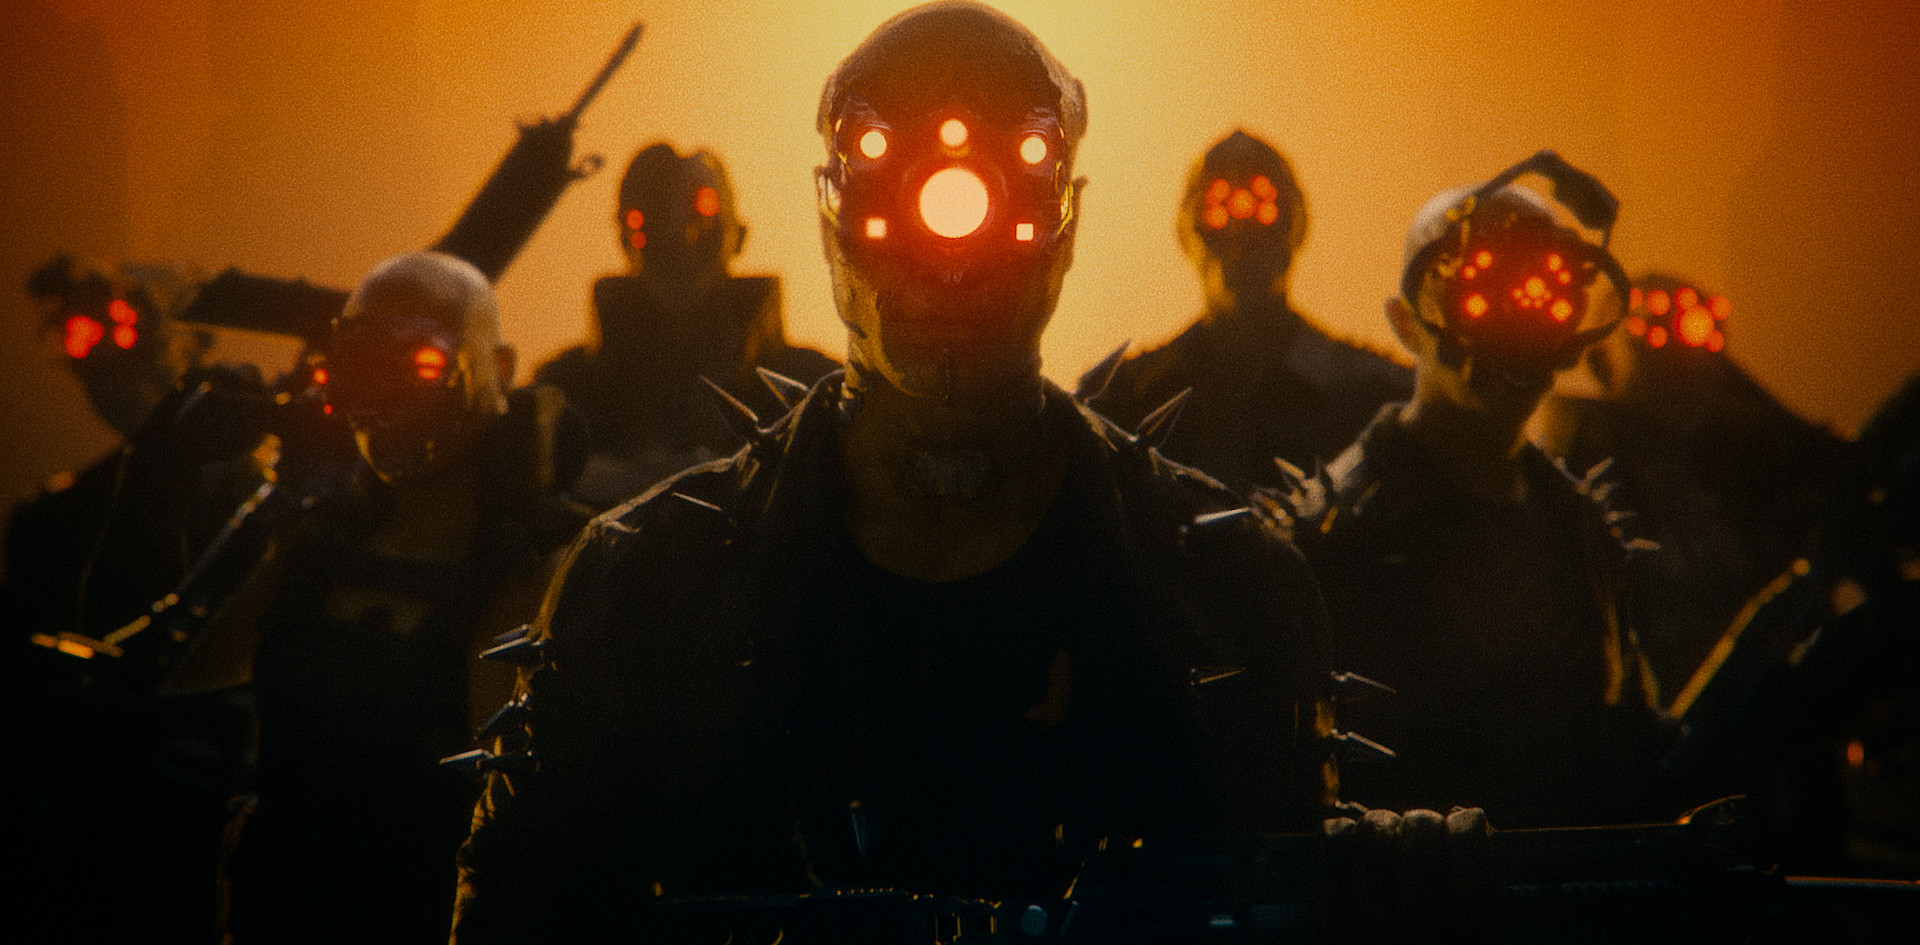 Run The Jewels x Cyberpunk 2077 - No Save Point